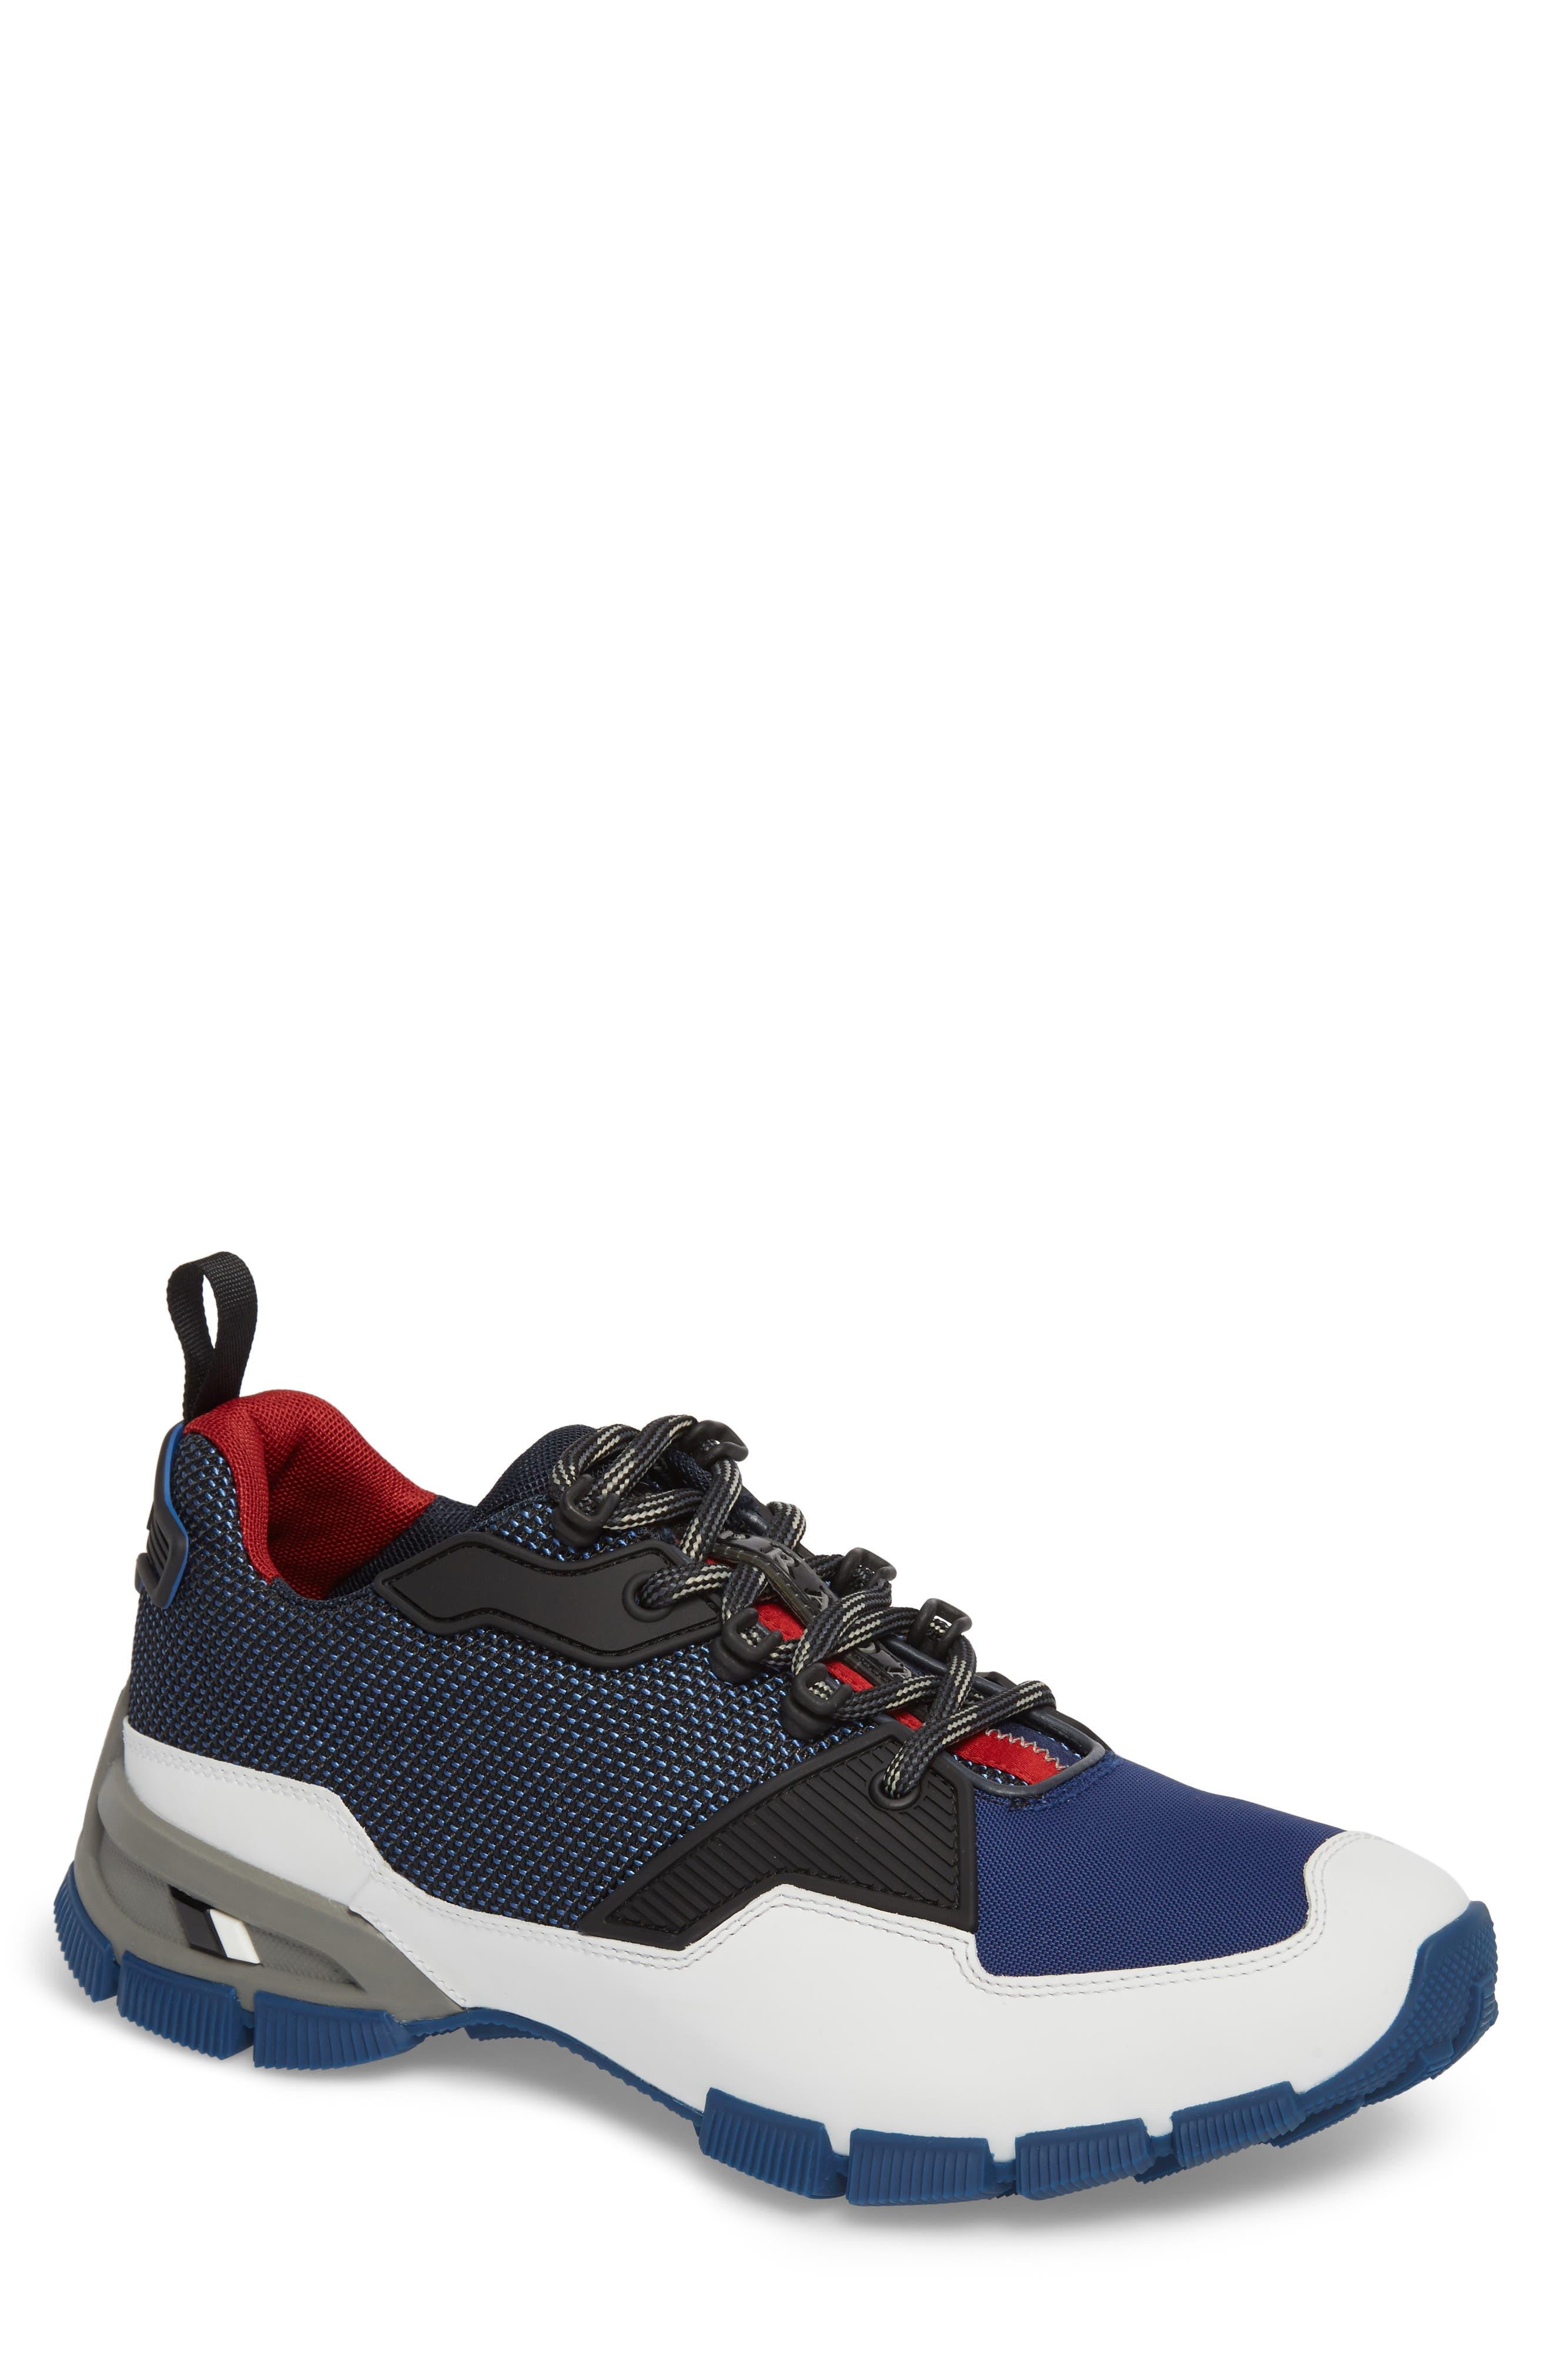 Alternate Image 1 Selected - Prada Linea Rossa Tech Lug Sneaker (Men)